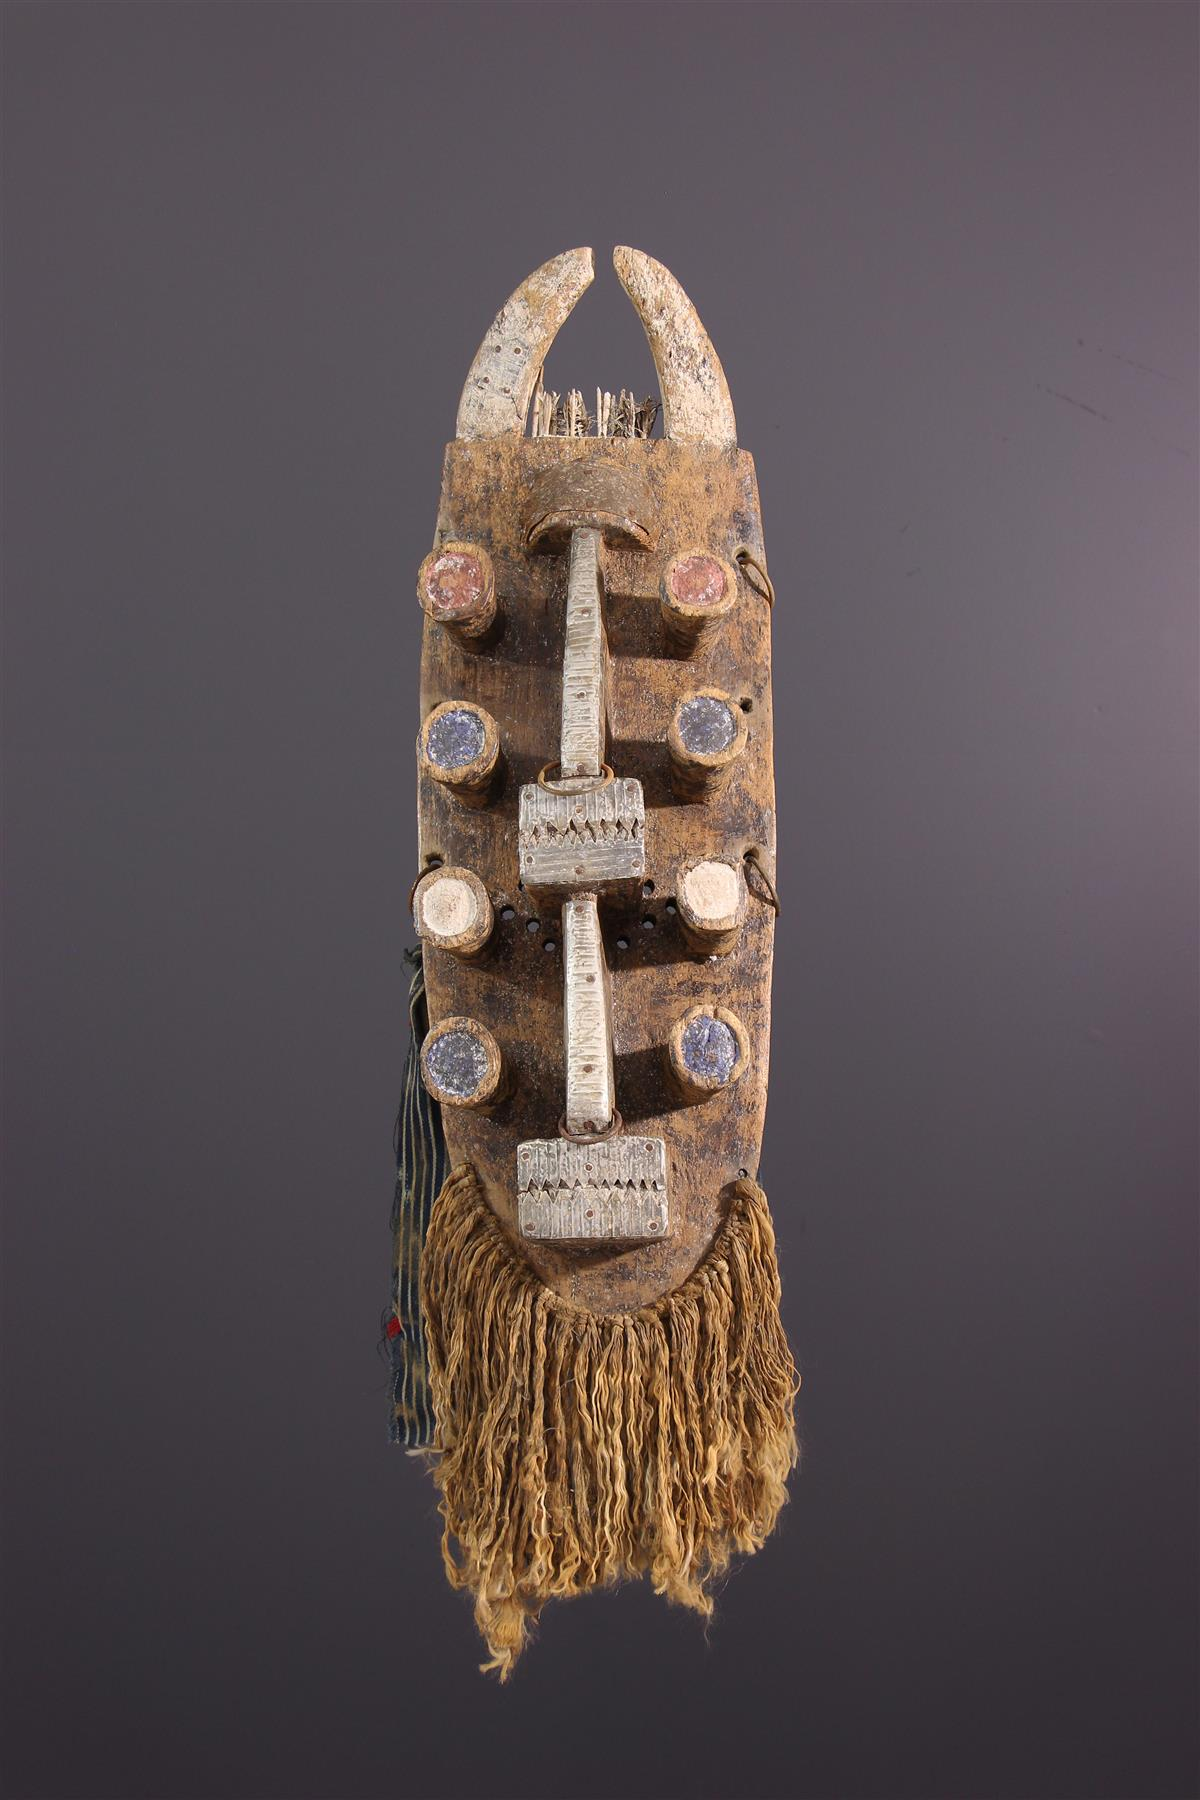 Kru Mask - African art